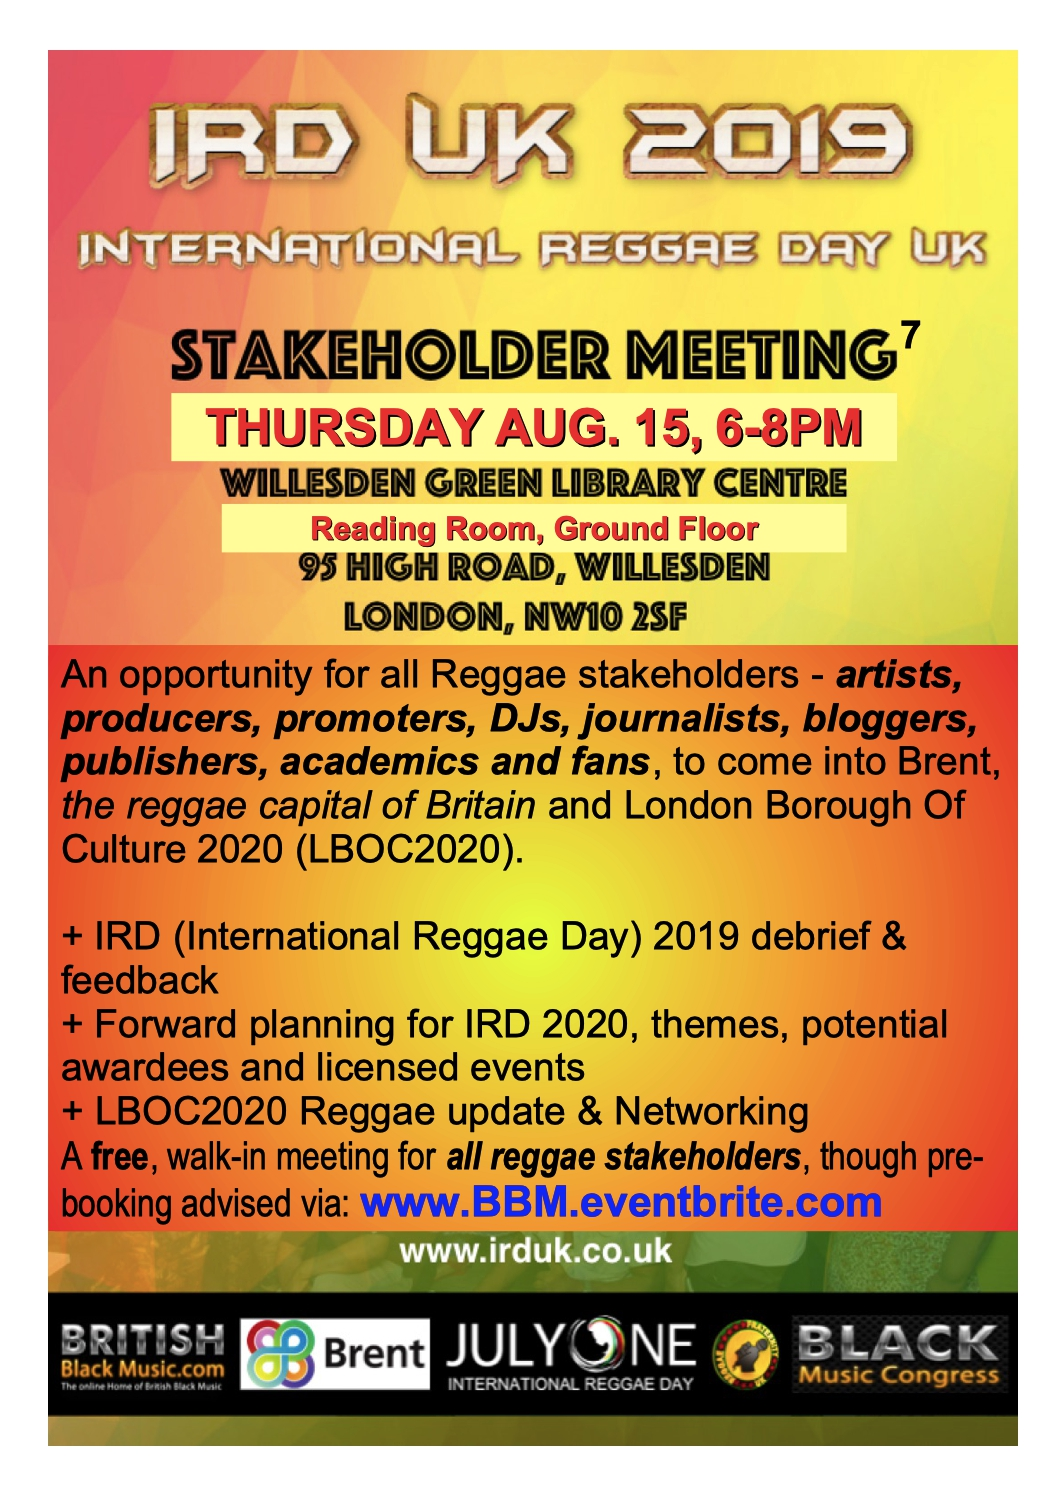 IRD STAKEHOLDER MEETING AUG 2019